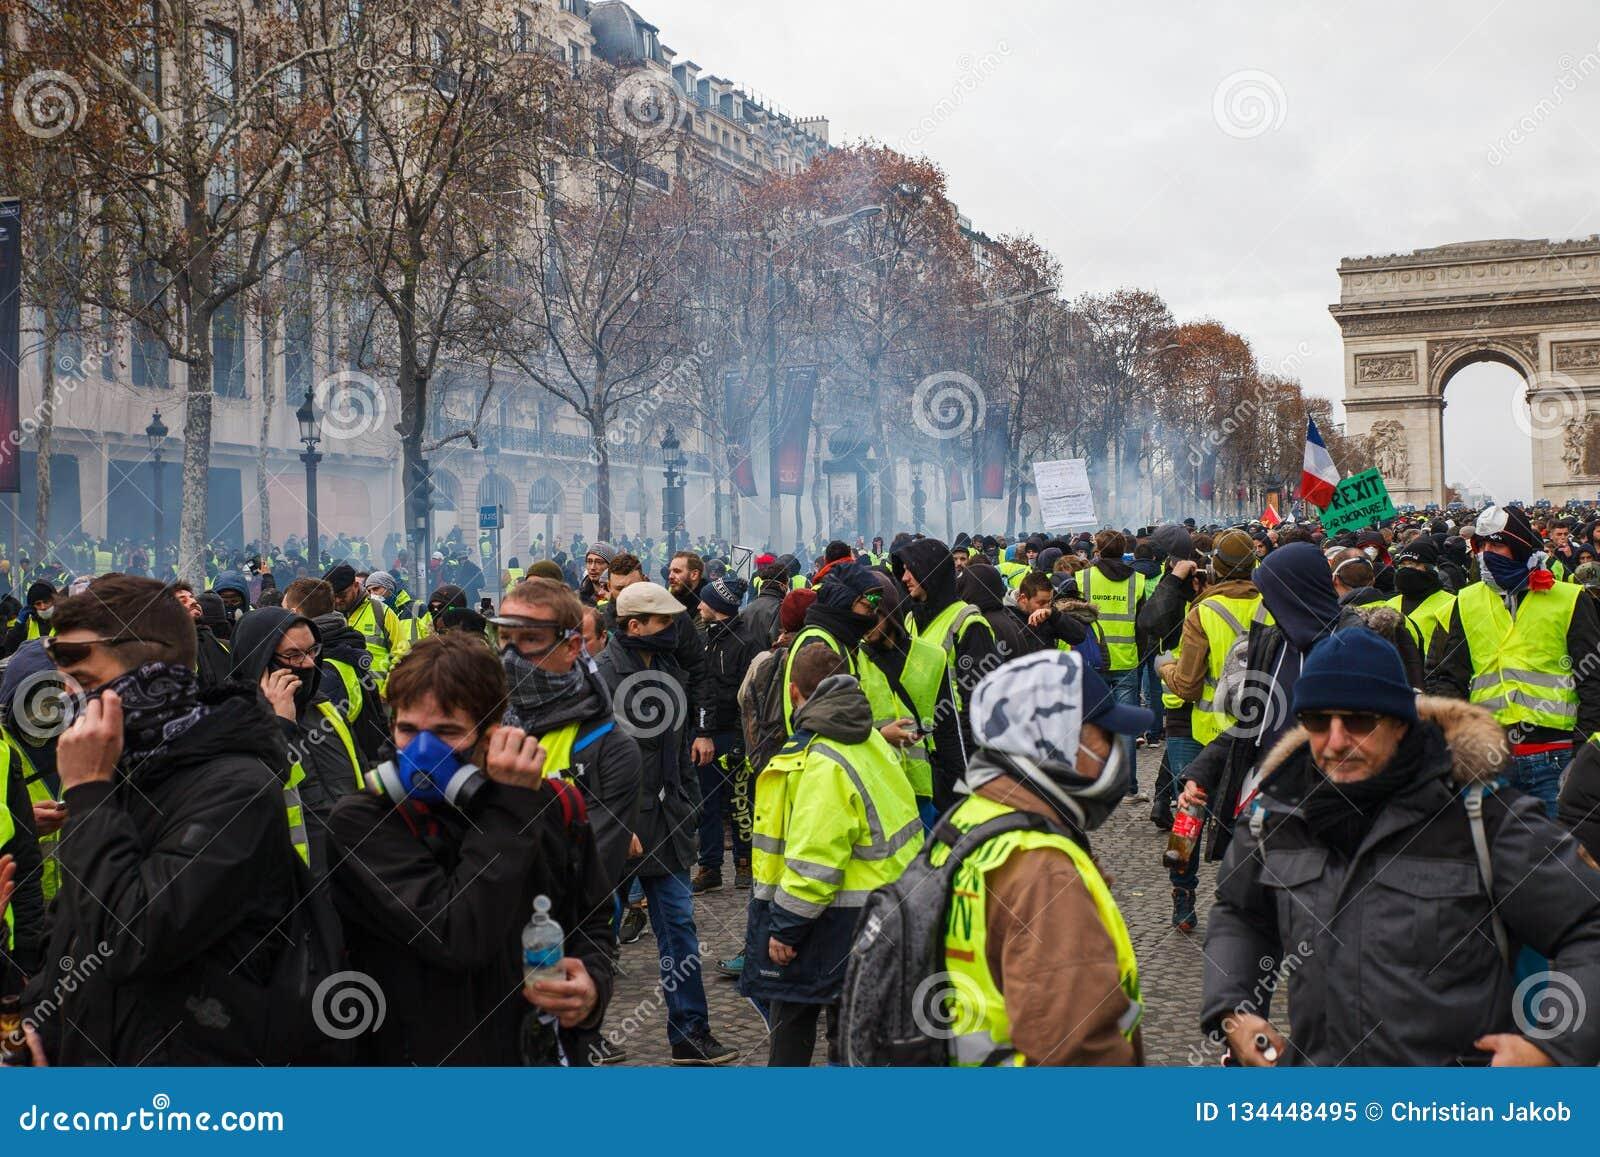 Demonstration of `Gilets Jaunes` in Paris, France